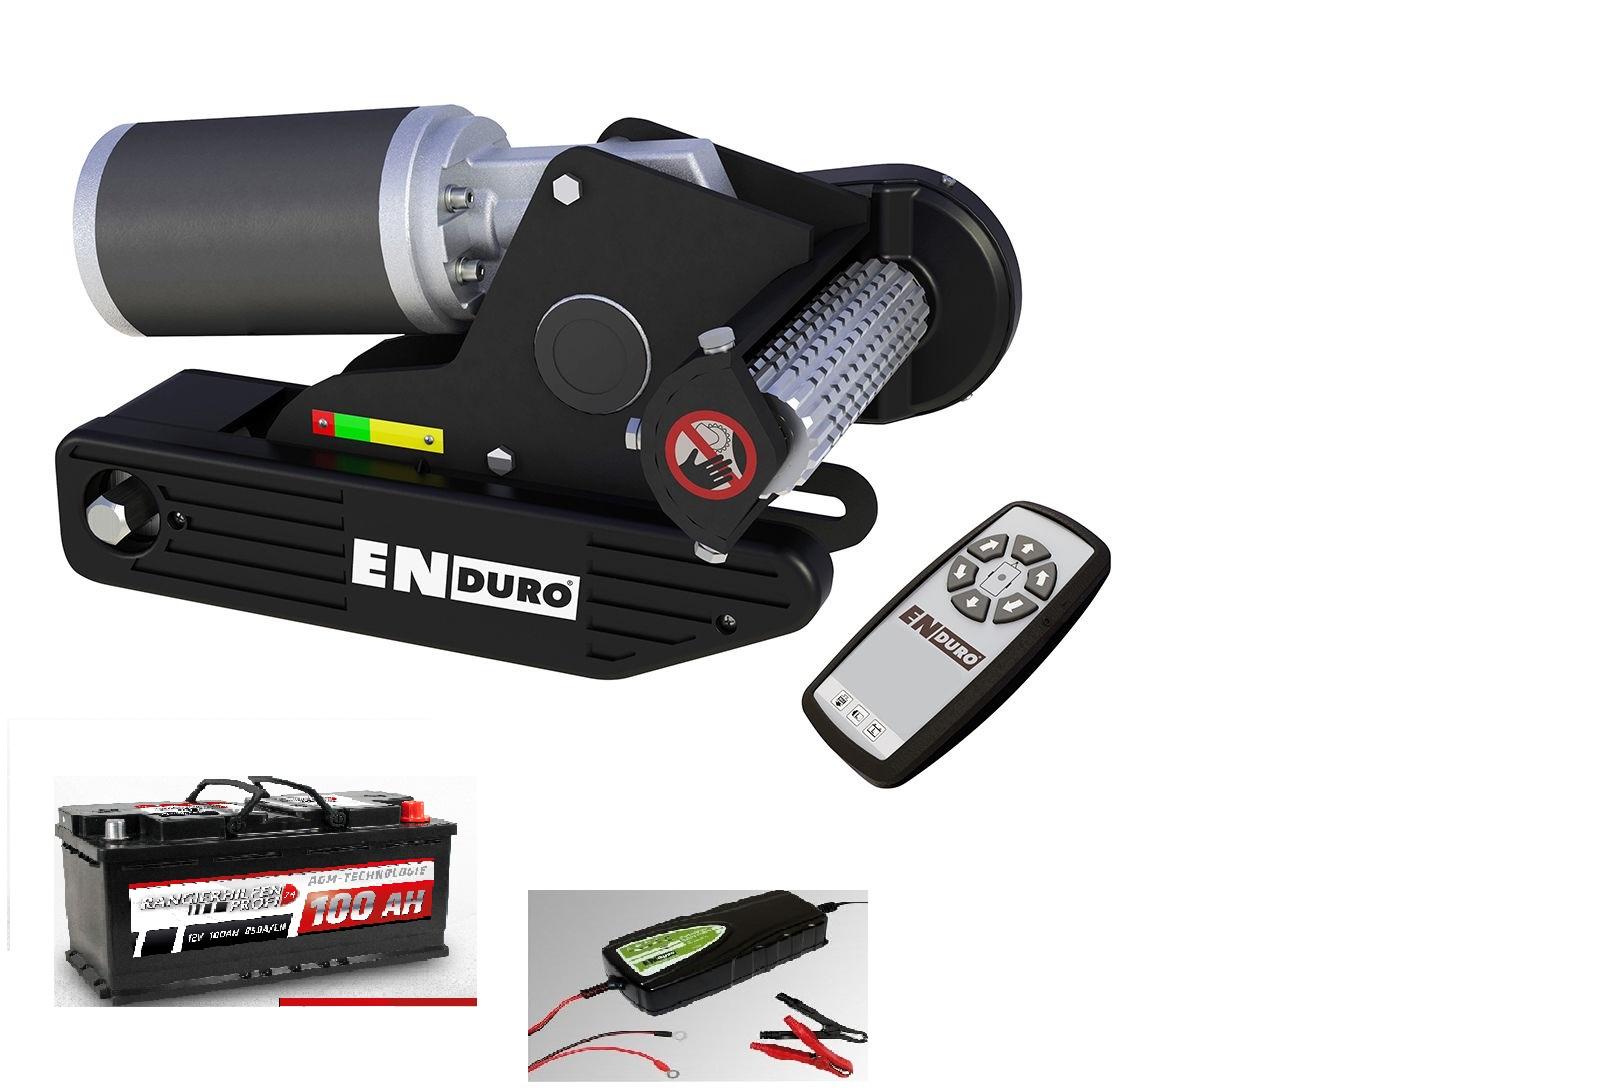 Enduro Em203 Agm Batterie 12v 100ah Ladegerät As1210 Wohnwagen